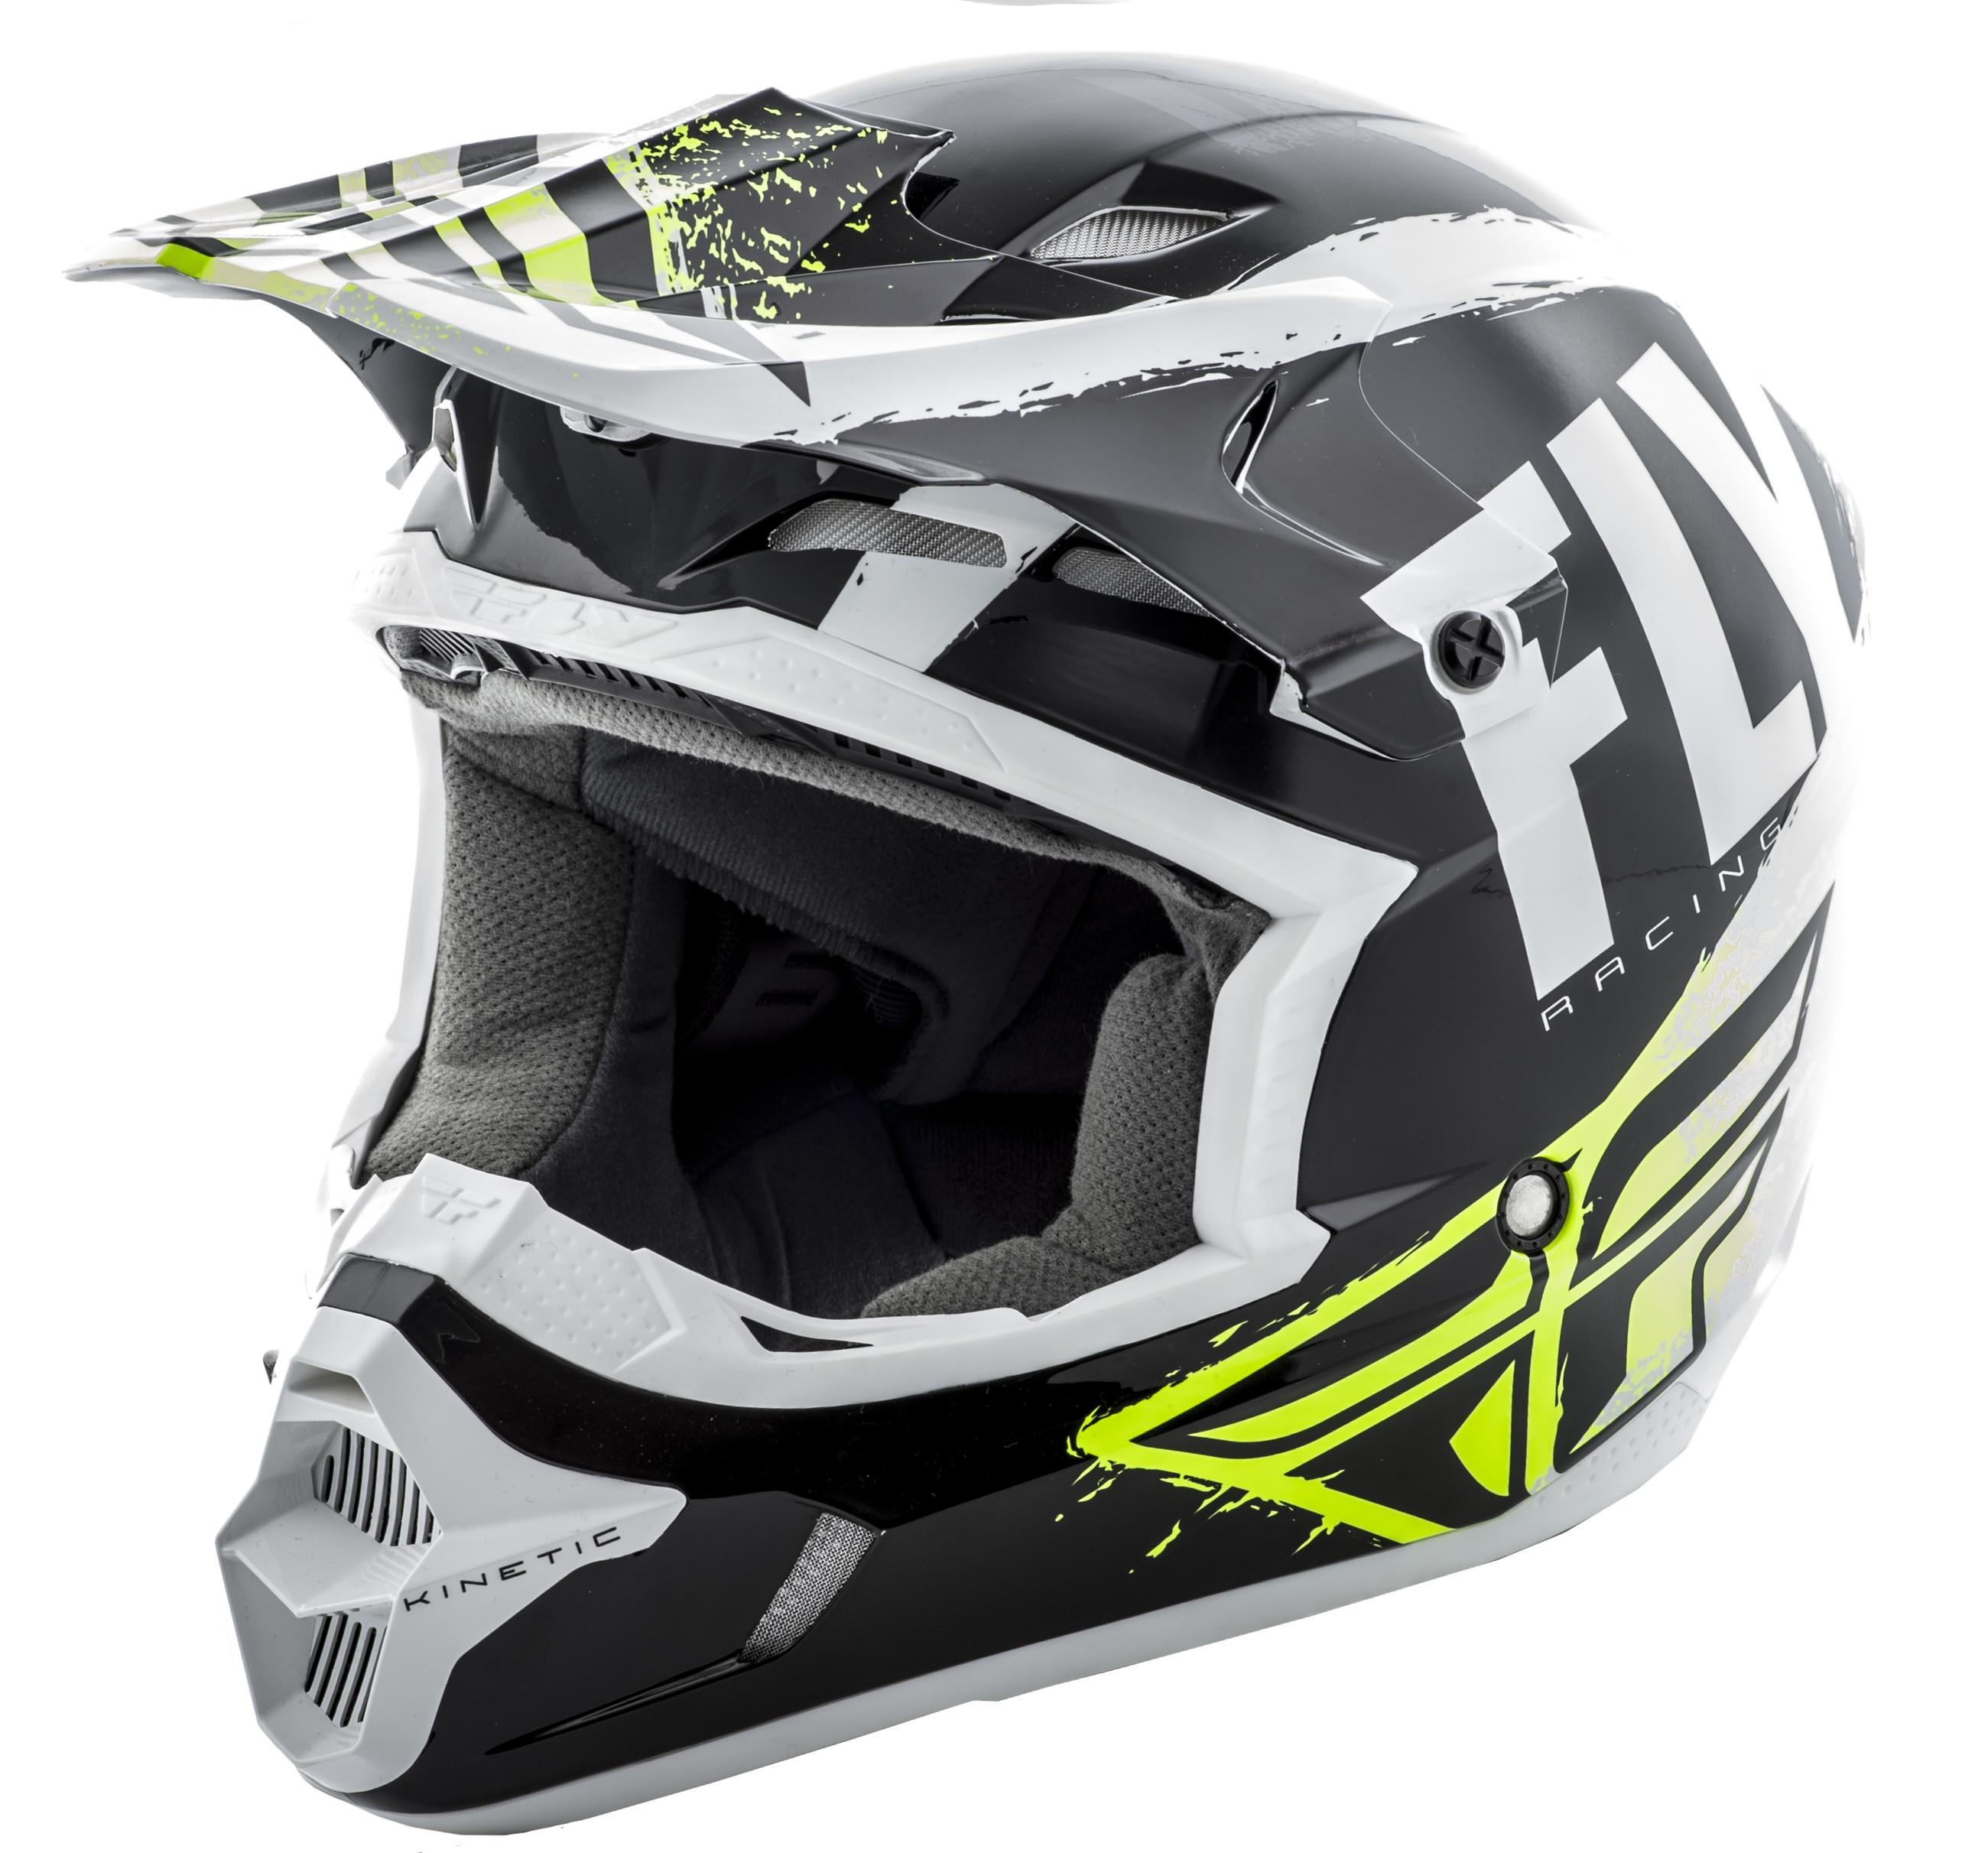 Kinetic Burnish Helmet Black/White/Hi-Vis 2X